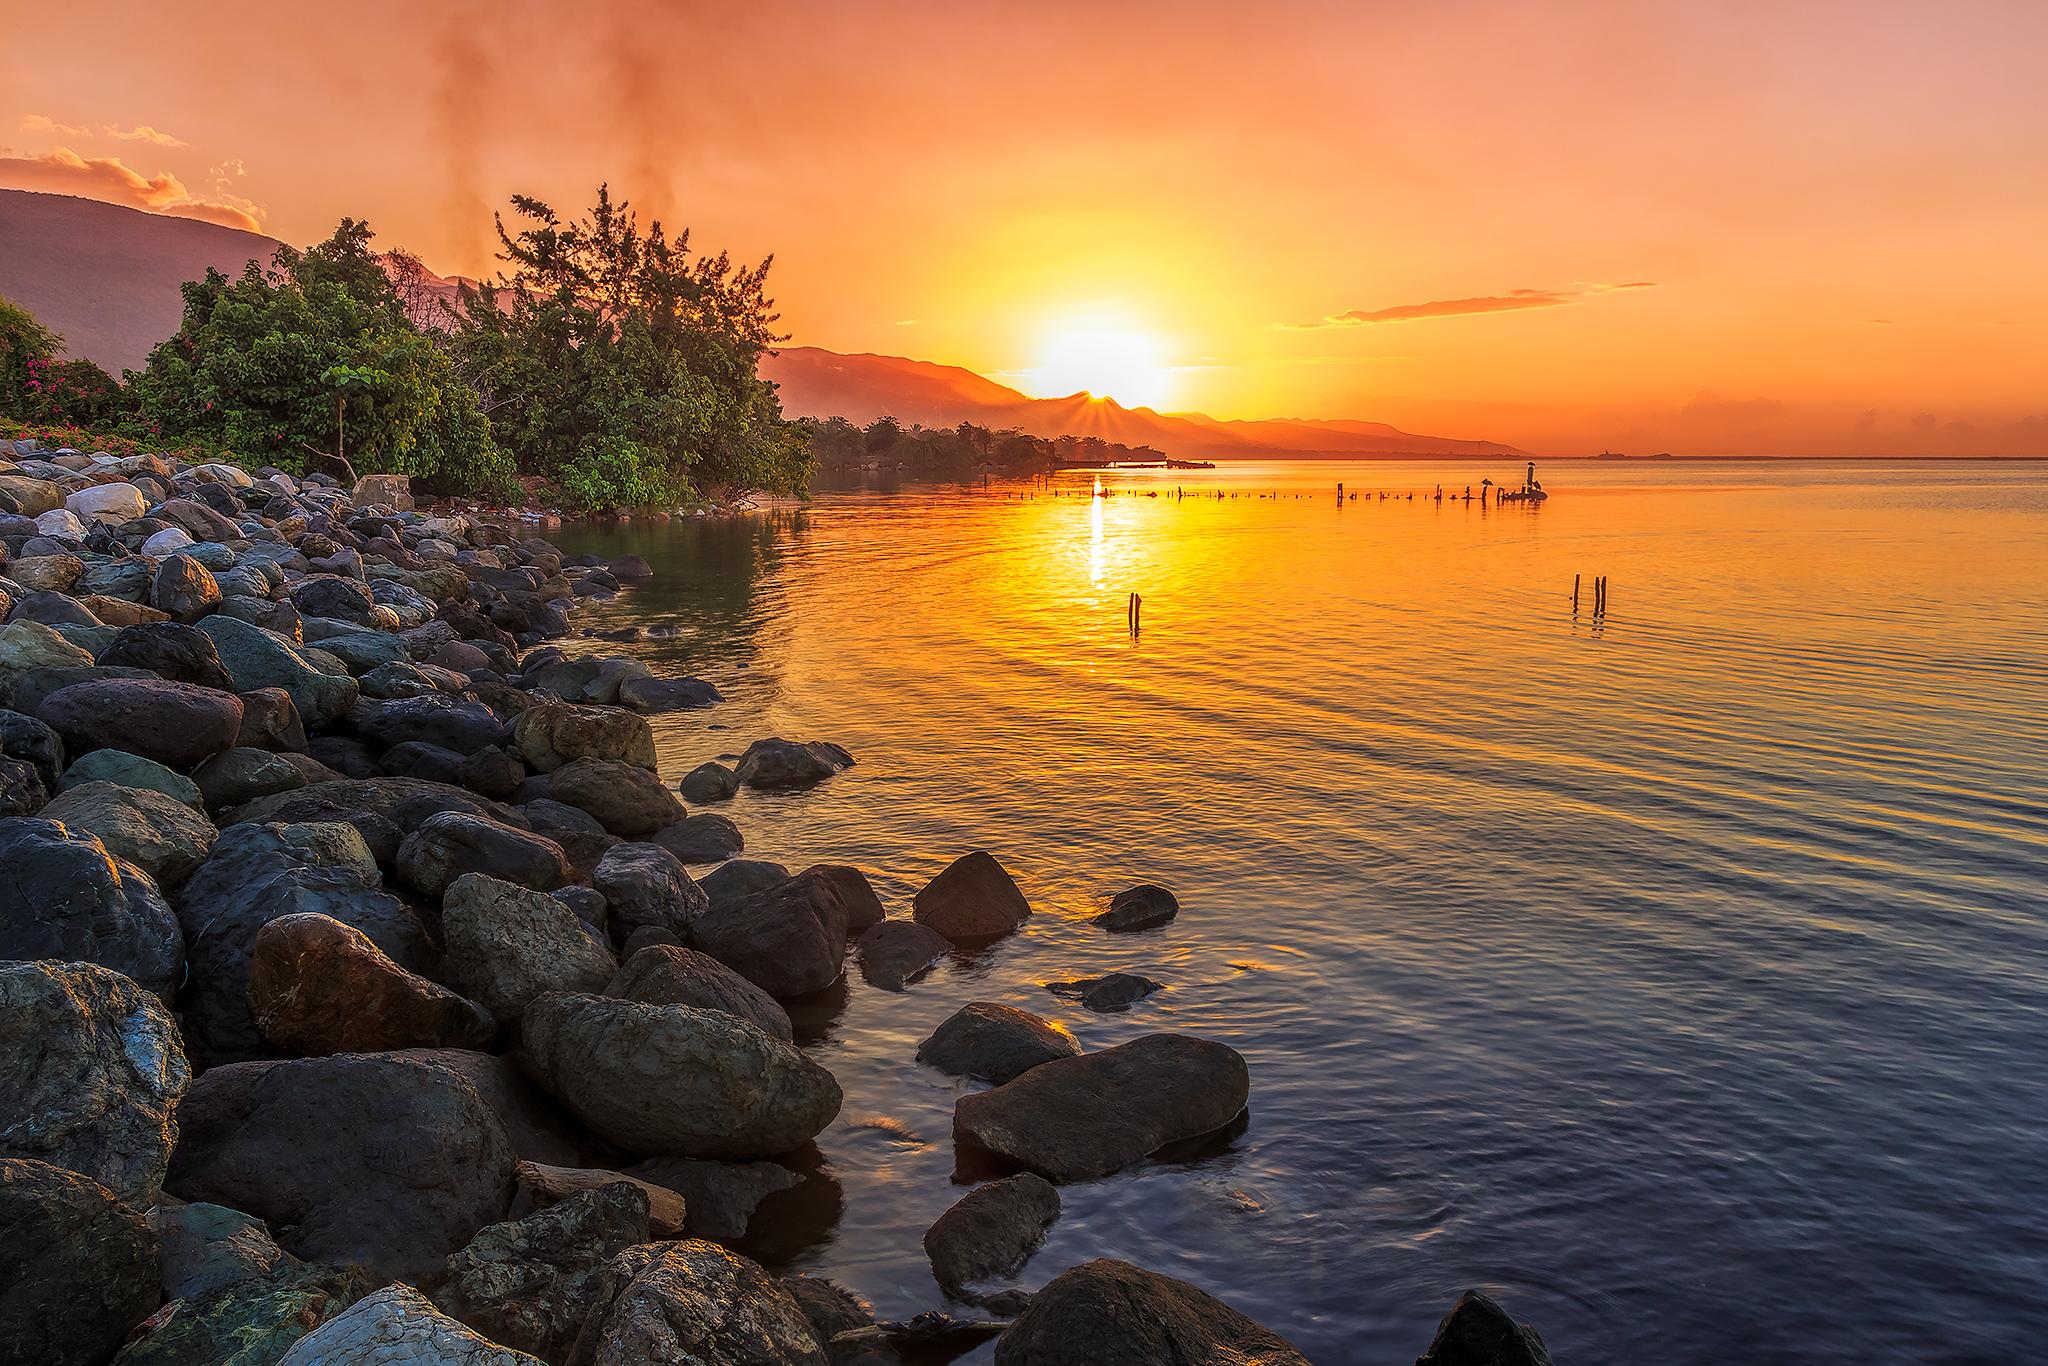 Sunrise in East Kingston,Jamaica